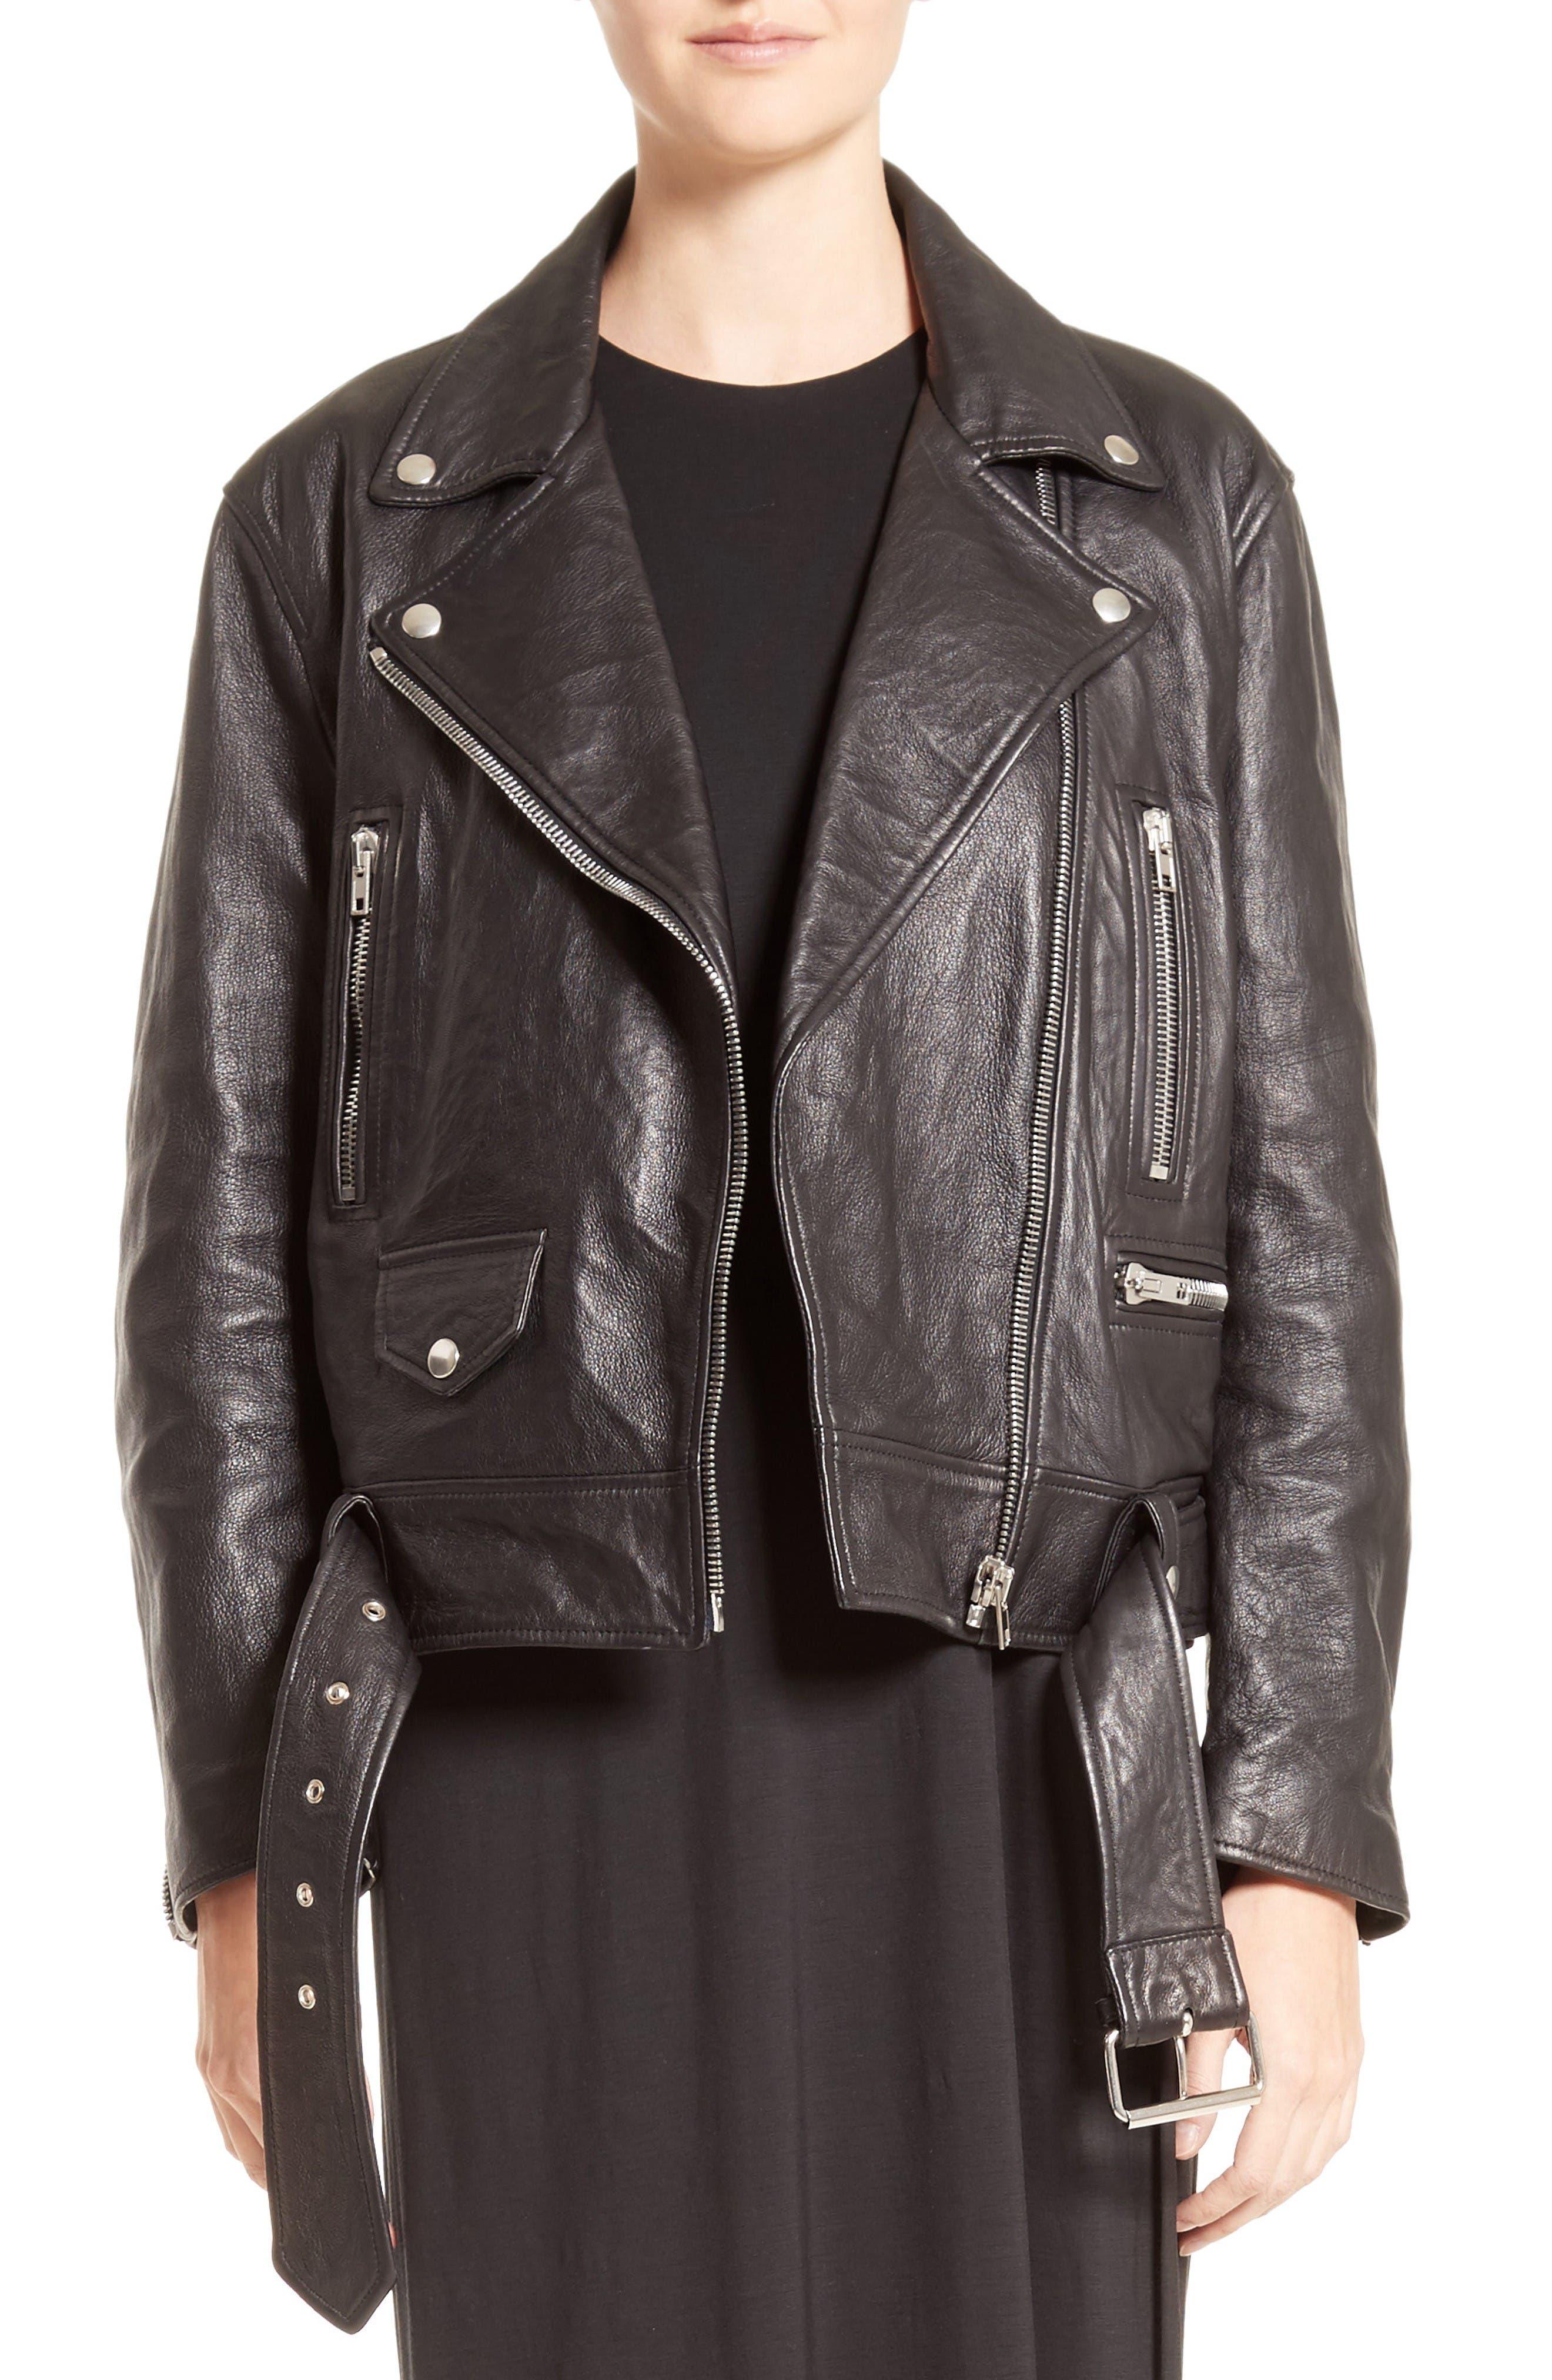 Merlyn Leather Jacket,                             Alternate thumbnail 7, color,                             Black